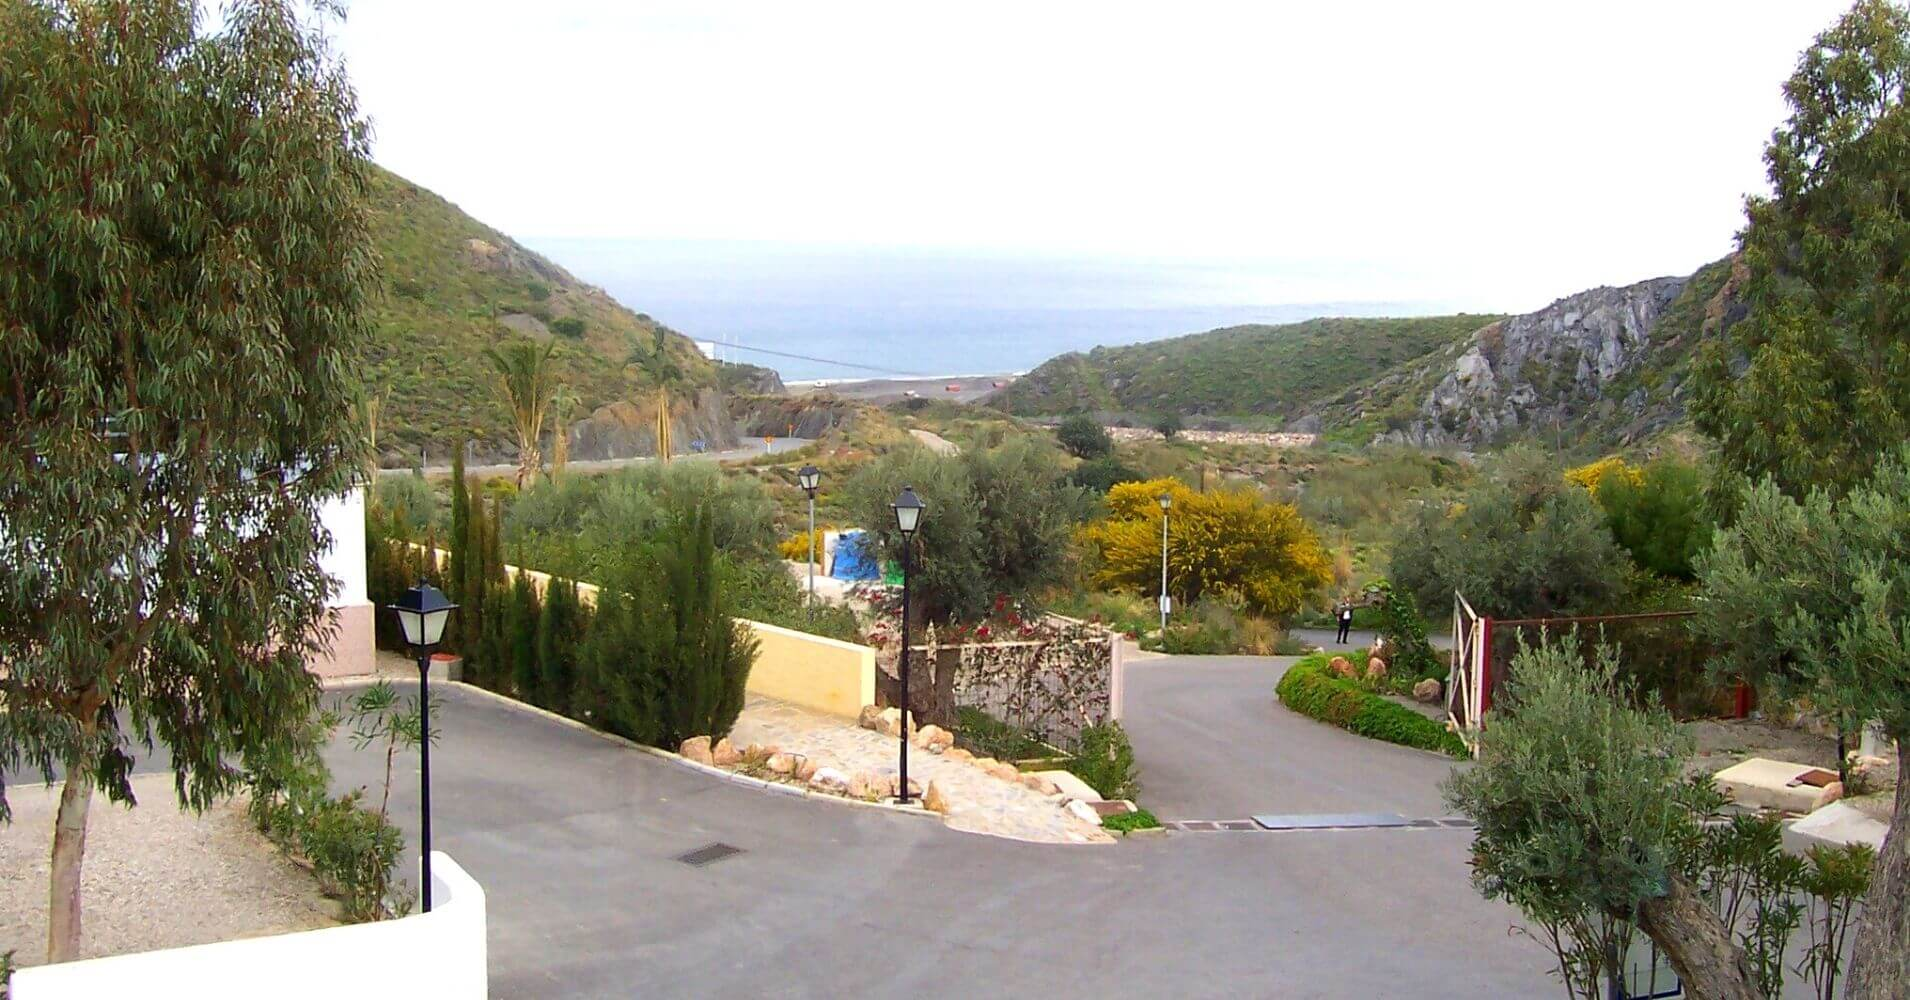 Entrada Camping Cueva Negra. Mojácar. Almería, Andalucía.